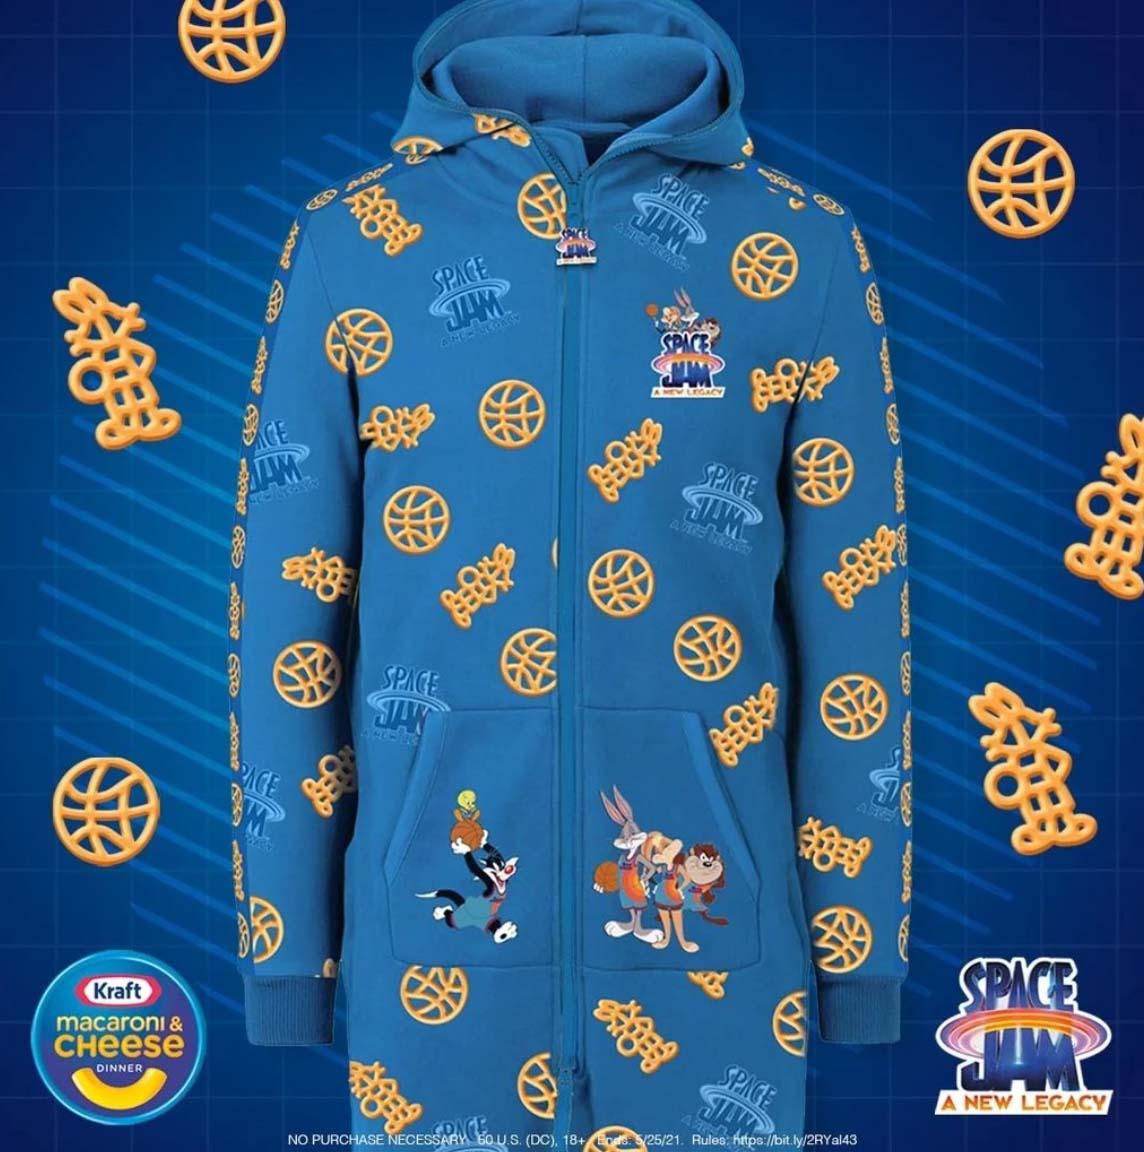 Kraft Mac and Cheese Space Jam Branded Merchandise